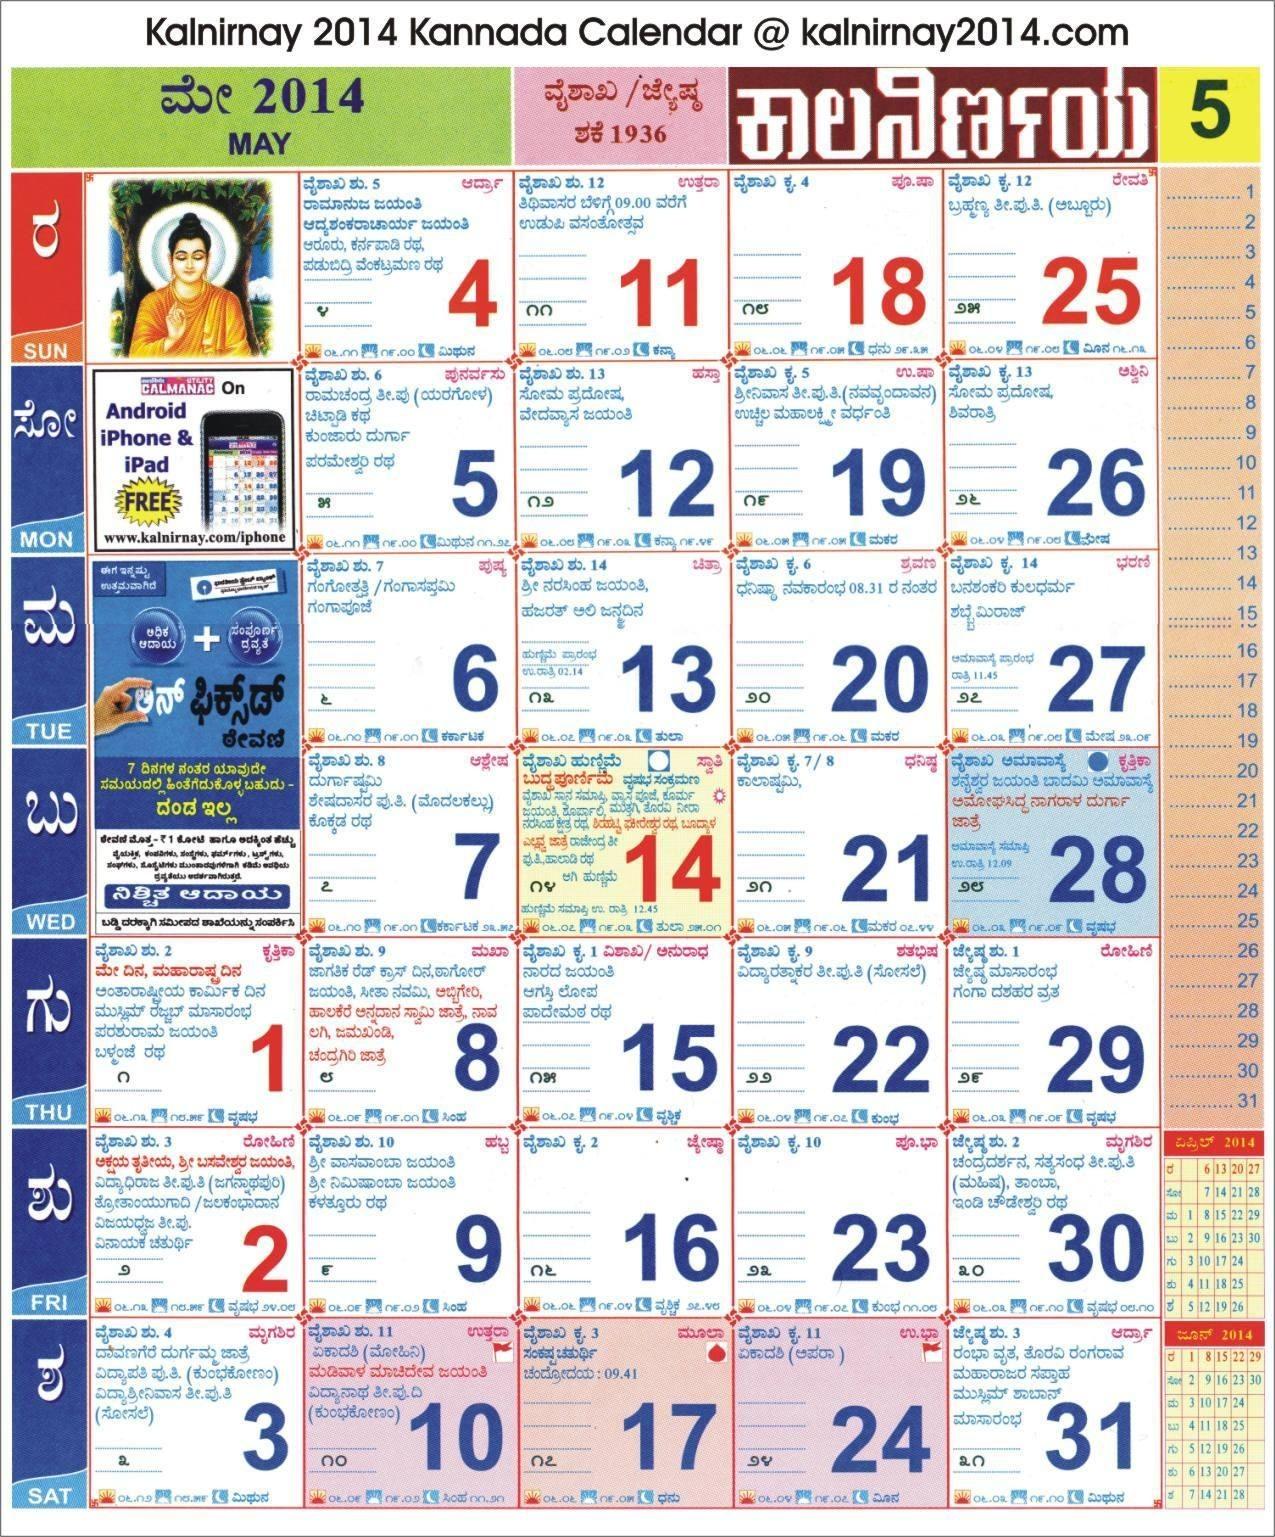 Calendario 2019 Para Imprimir Con Feriados Venezuela Actual May 2014 Kannada Kalnirnay Calendar Of Calendario 2019 Para Imprimir Con Feriados Venezuela Más Populares Informacion Calendario 2019 Datas Emorativas